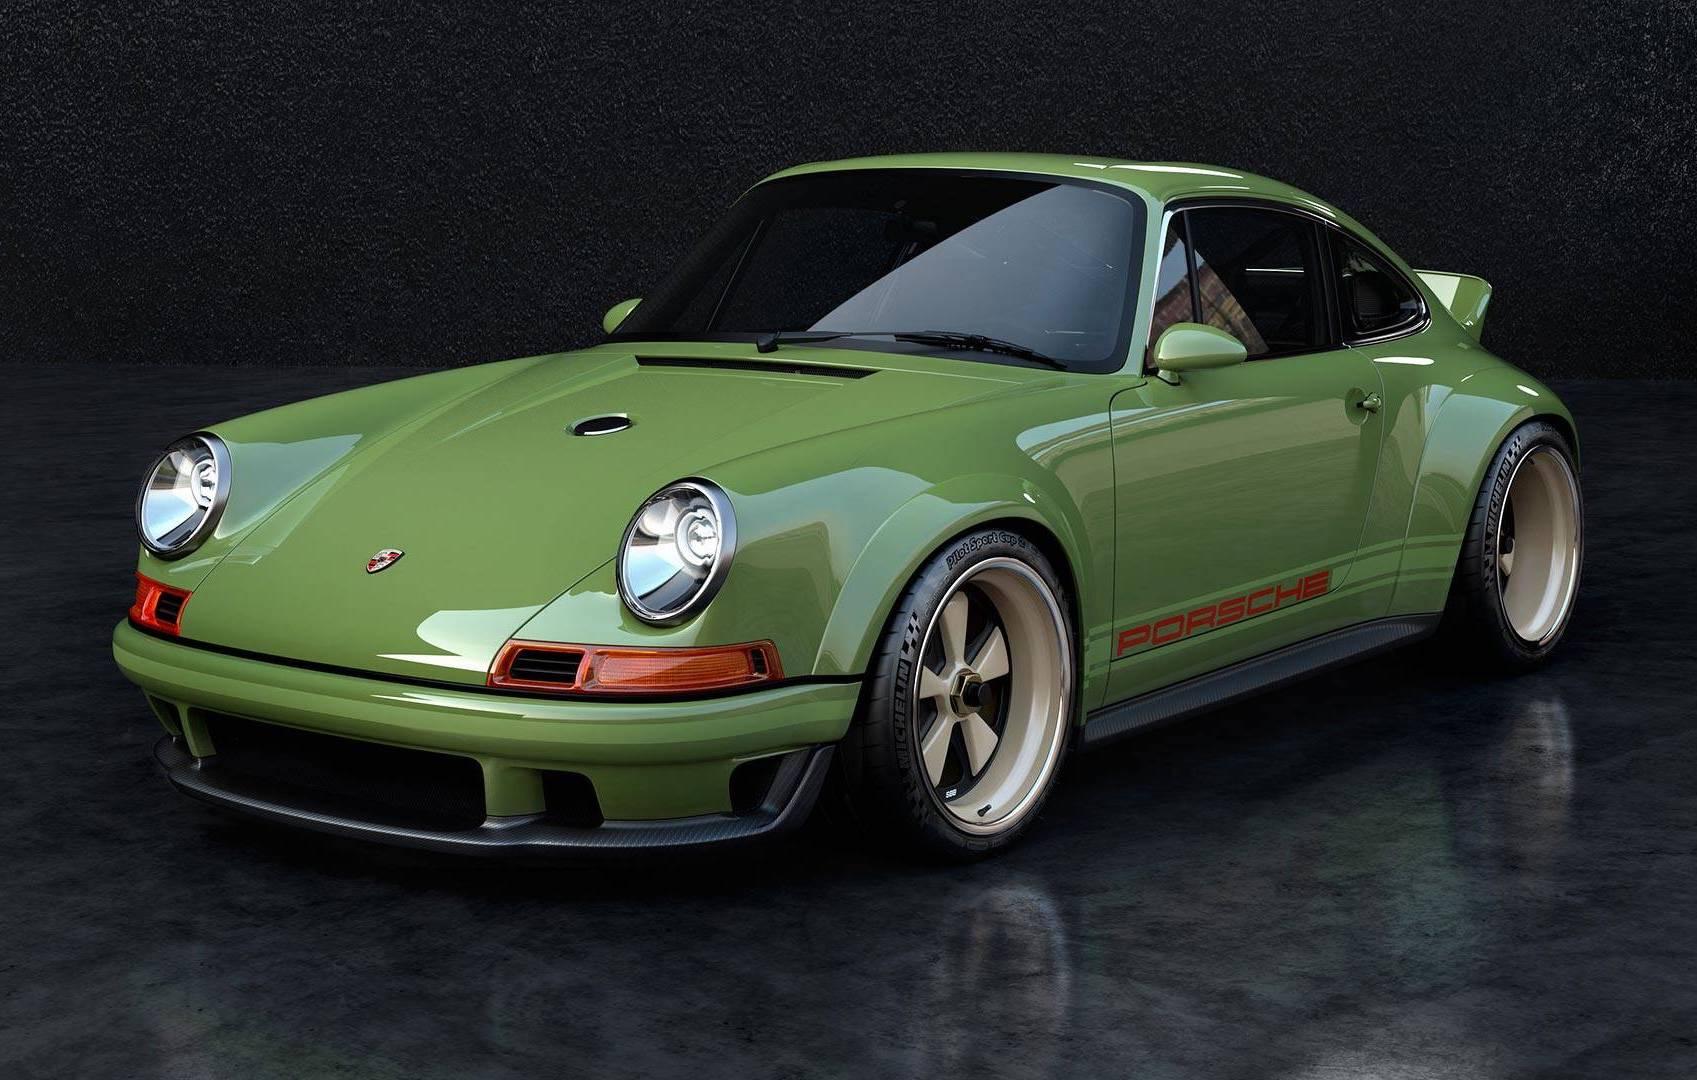 Singer Design Porsche 911 project with Williams tech